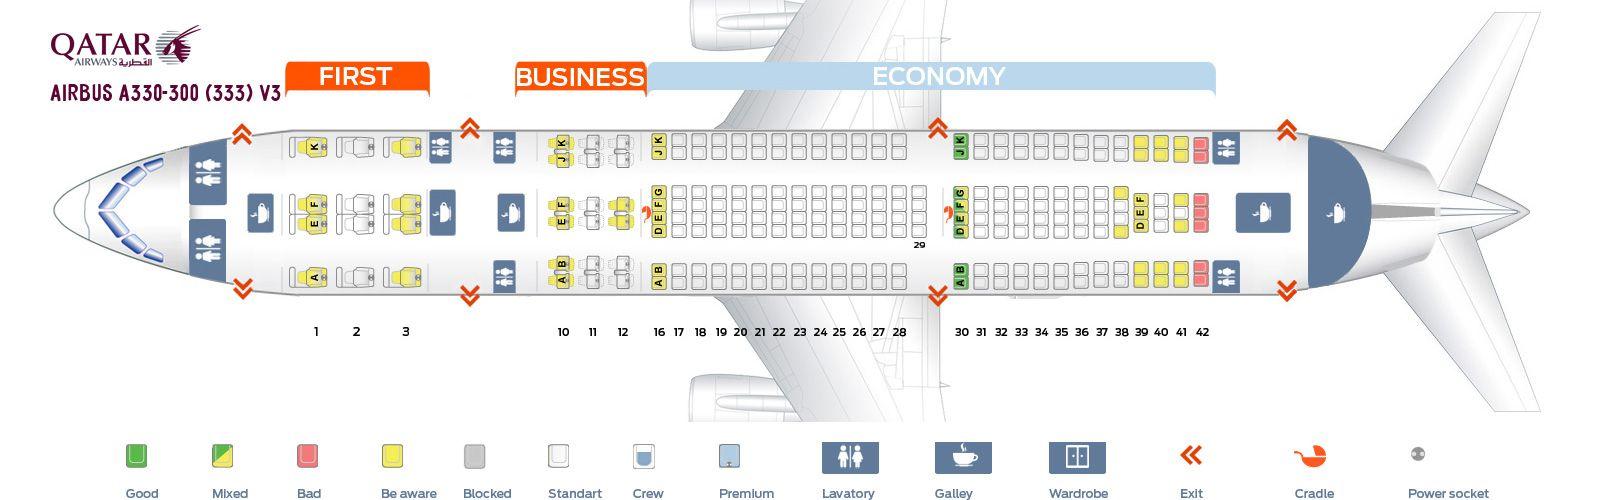 Qatar Airways Fleet Airbus A330 300 Details And Pictures